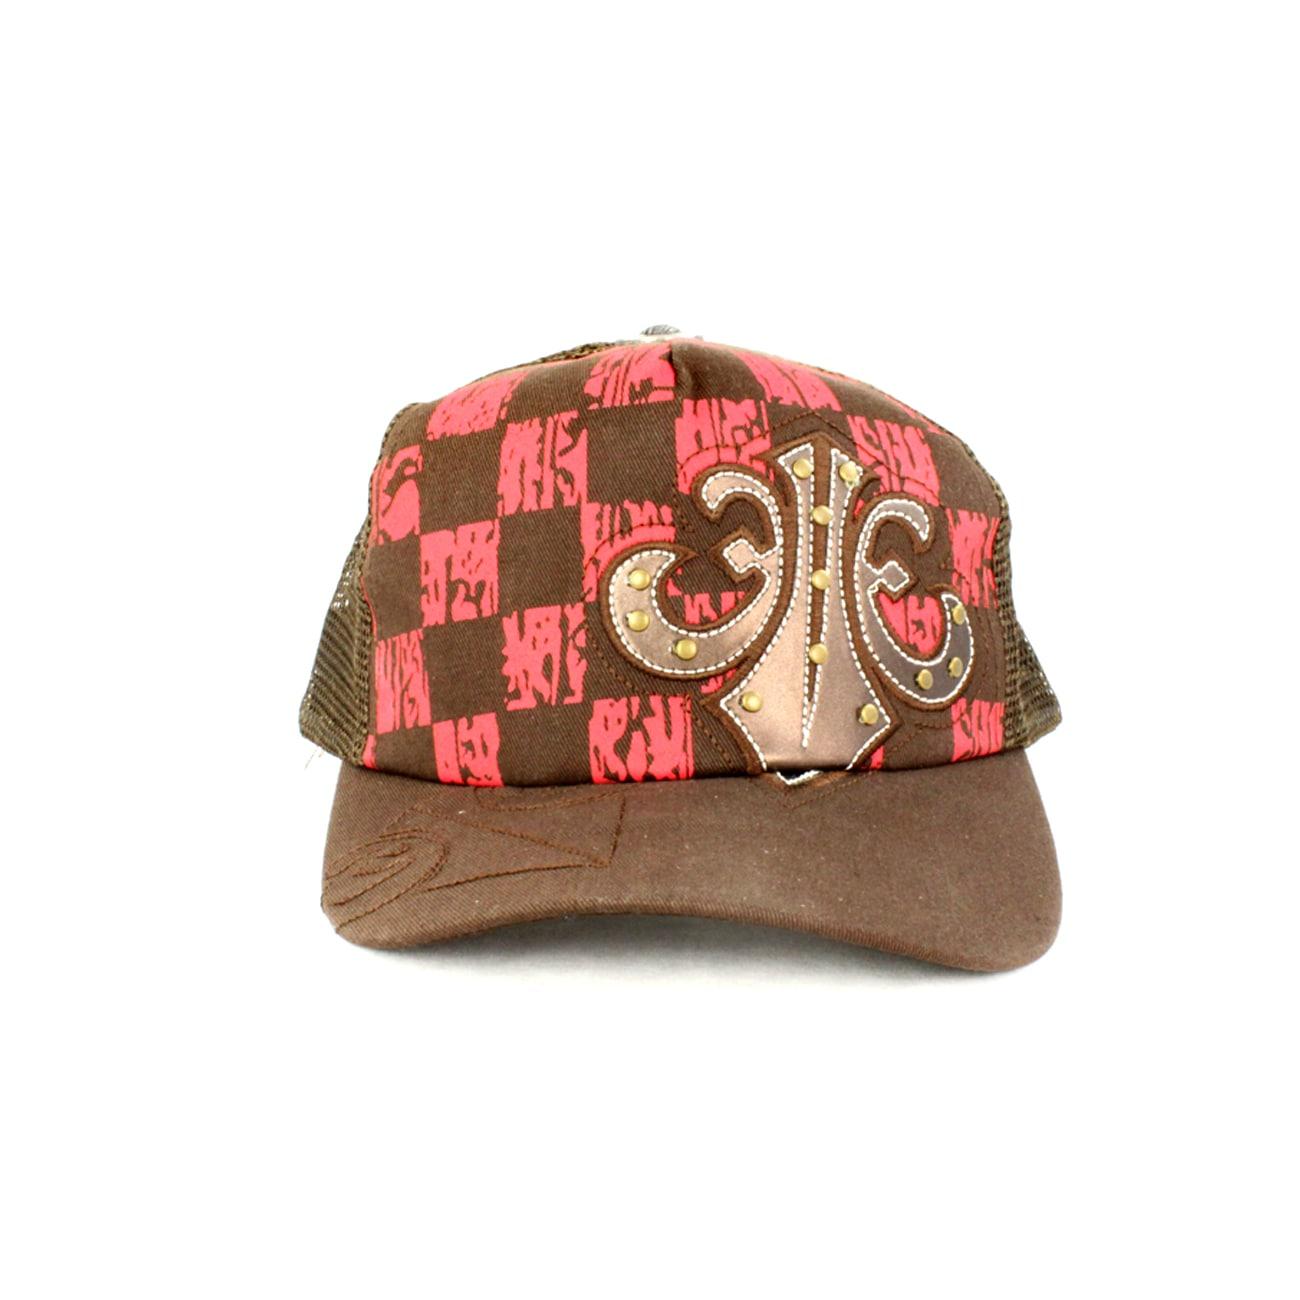 Faddism Unisex Brown/Red Checkered Fashion Baseball Cap